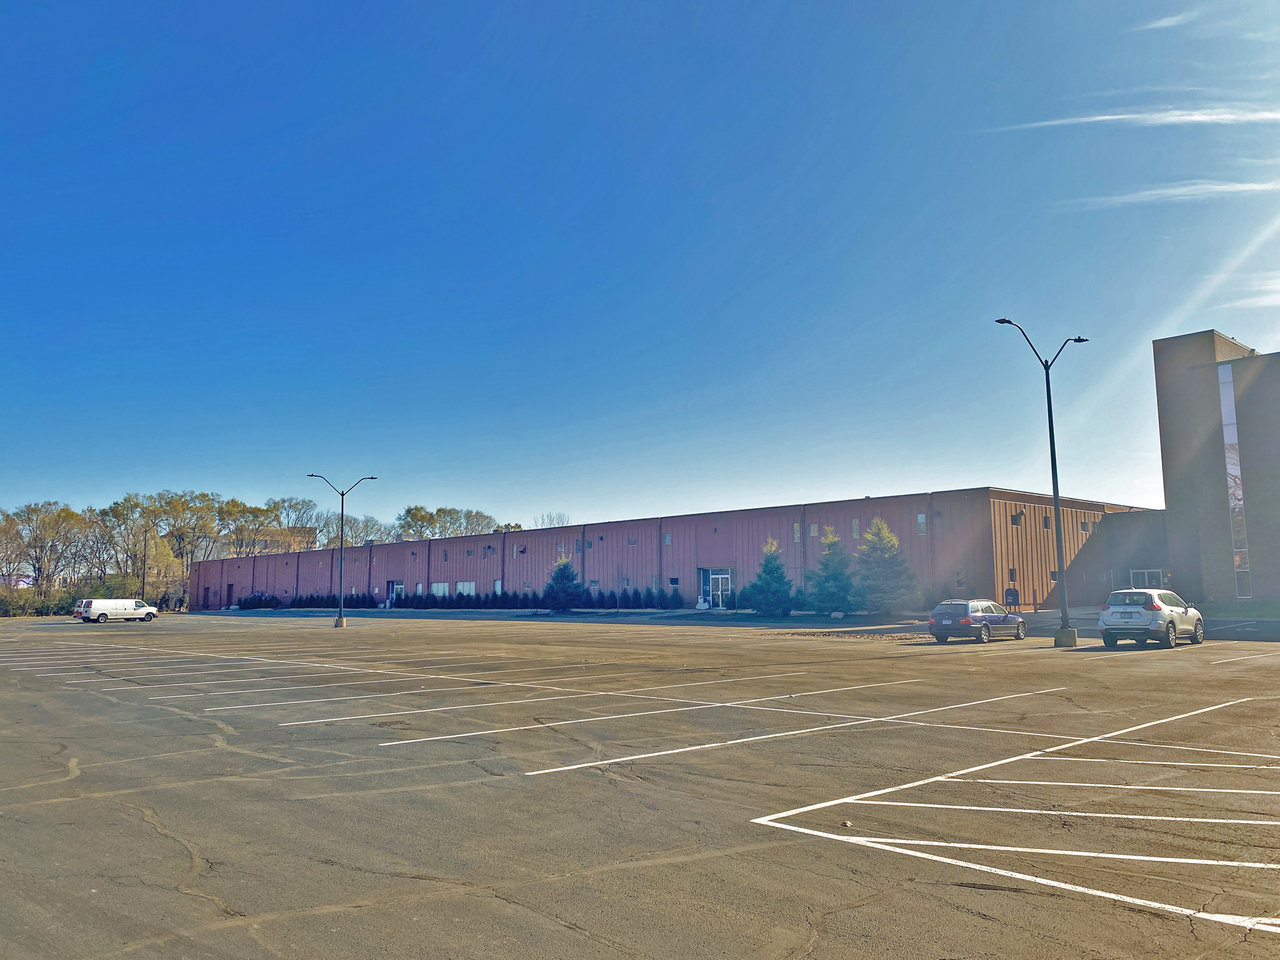 715 Florida Ave S, Golden Valley, MN, 55426